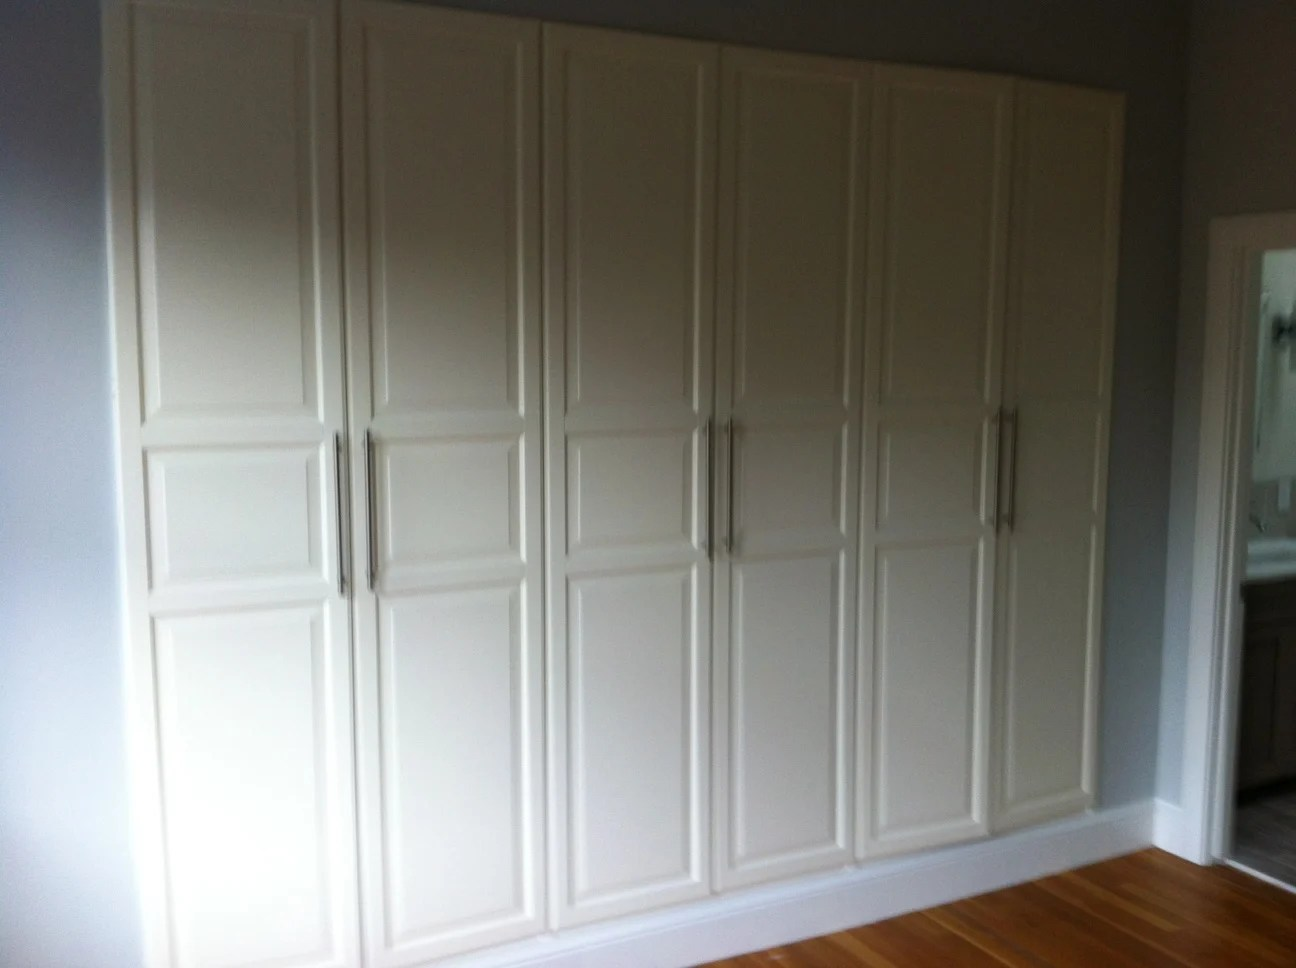 Pax Built Ins The Tall Doors Ikea Hackers # Muebles Birkeland Ikea